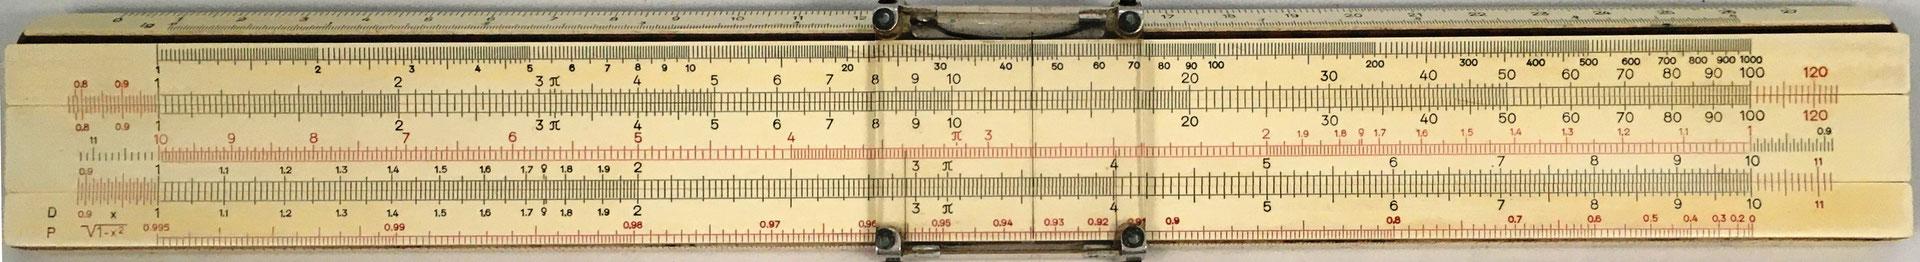 Regla FABER-CASTELL 1/54, regla de cálculo en español, año 1970, 30x4 cm